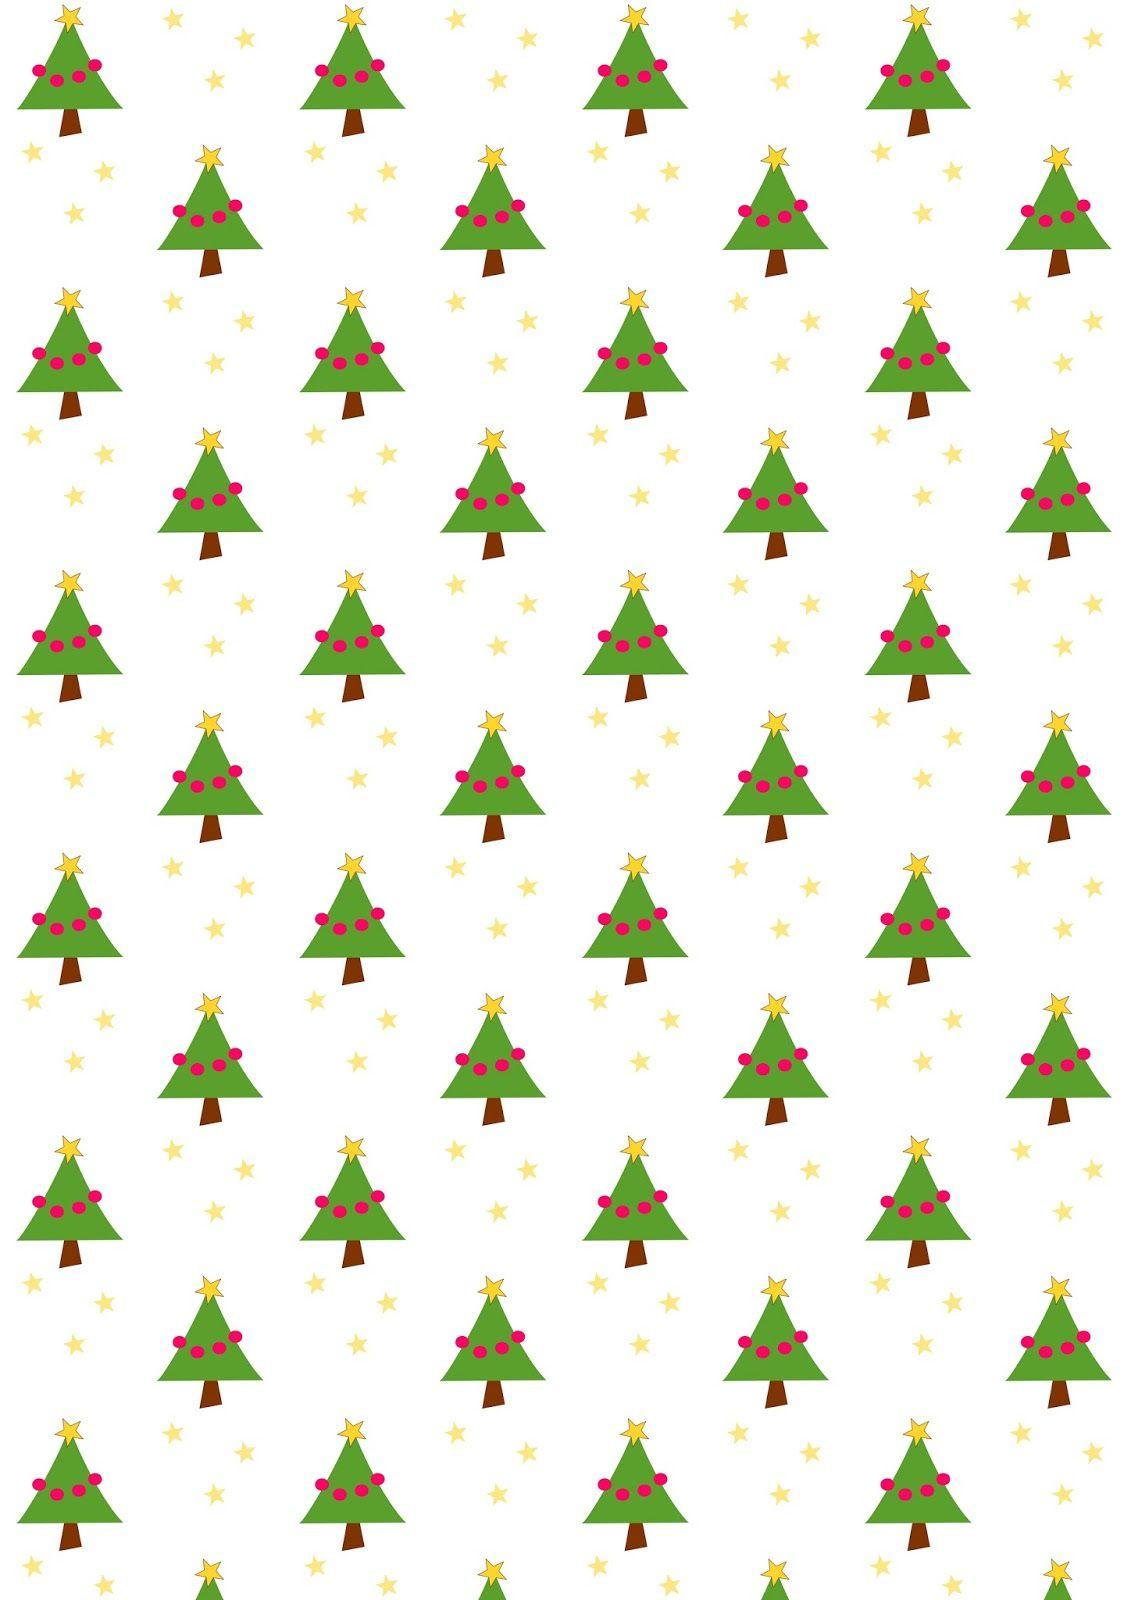 Free Digital Christmas Scrapbooking Paper - Ausdruckbares - Free Printable Christmas Paper